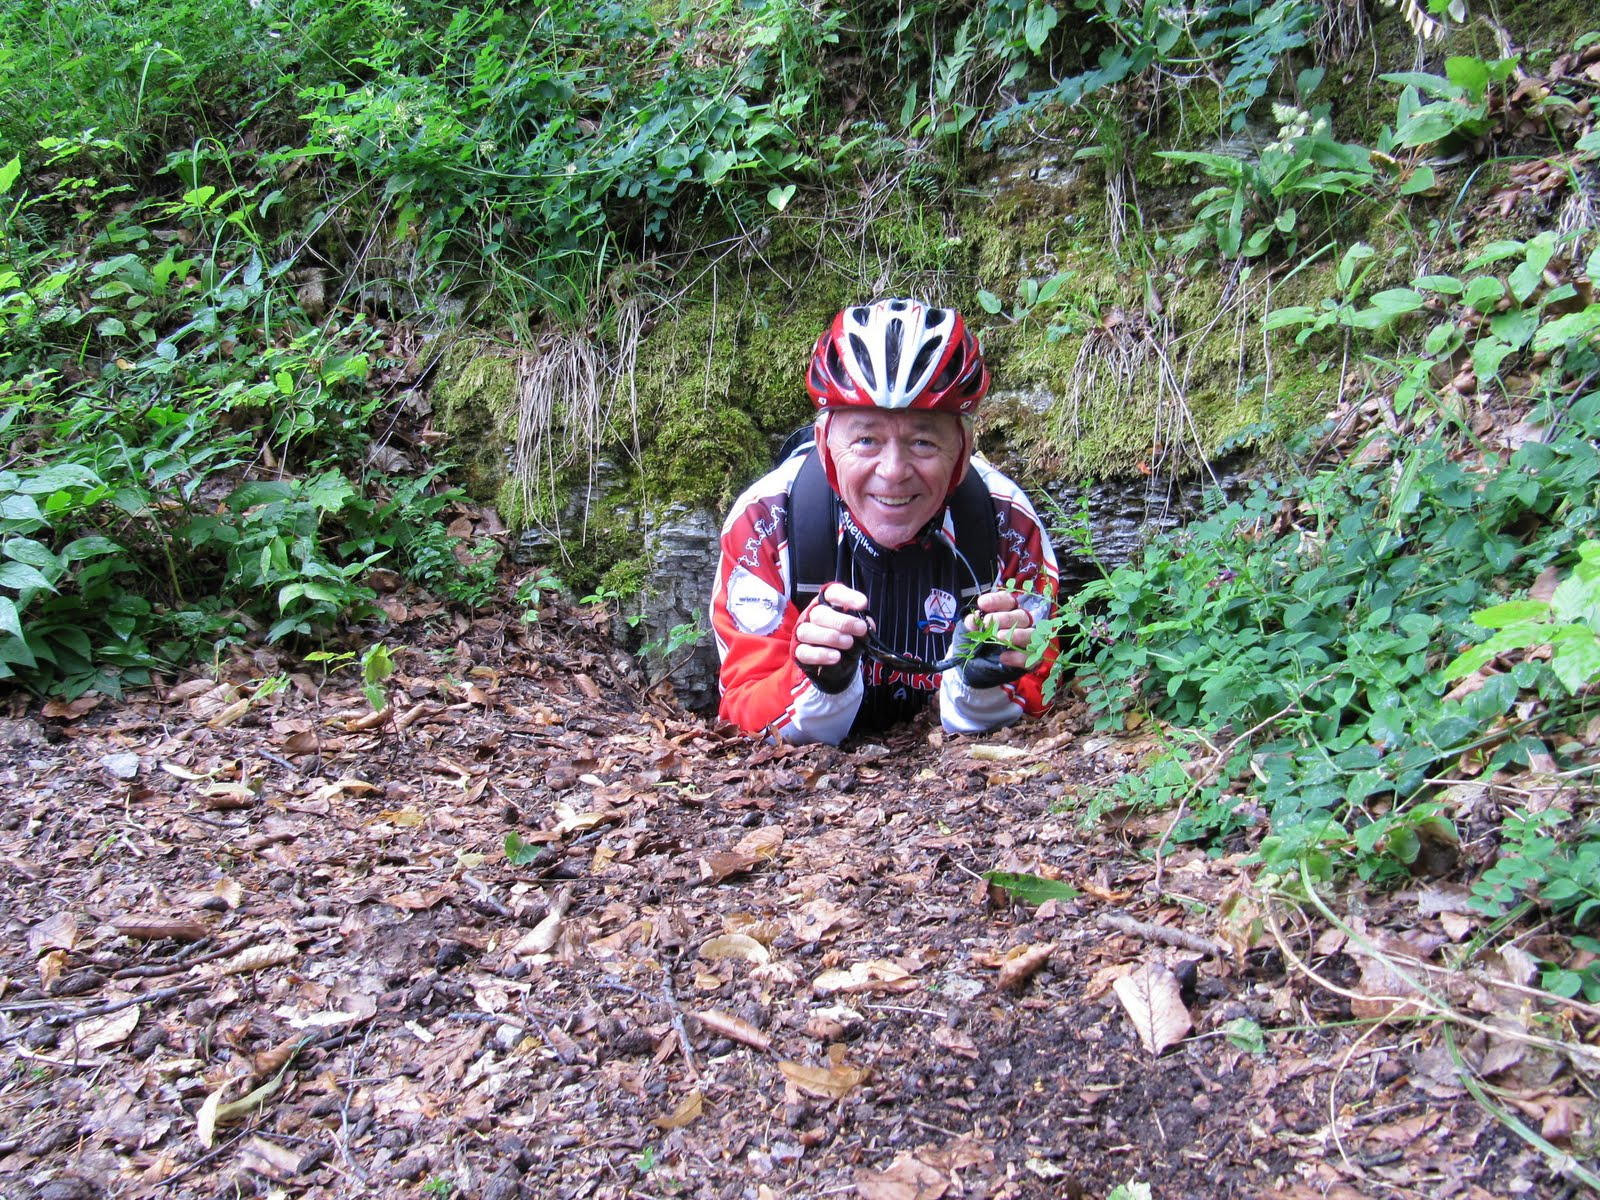 Singlespeed bei regen Fixie fahren lernen - Singlespeed kennenlernen › 🥇 Fahrrad Blog